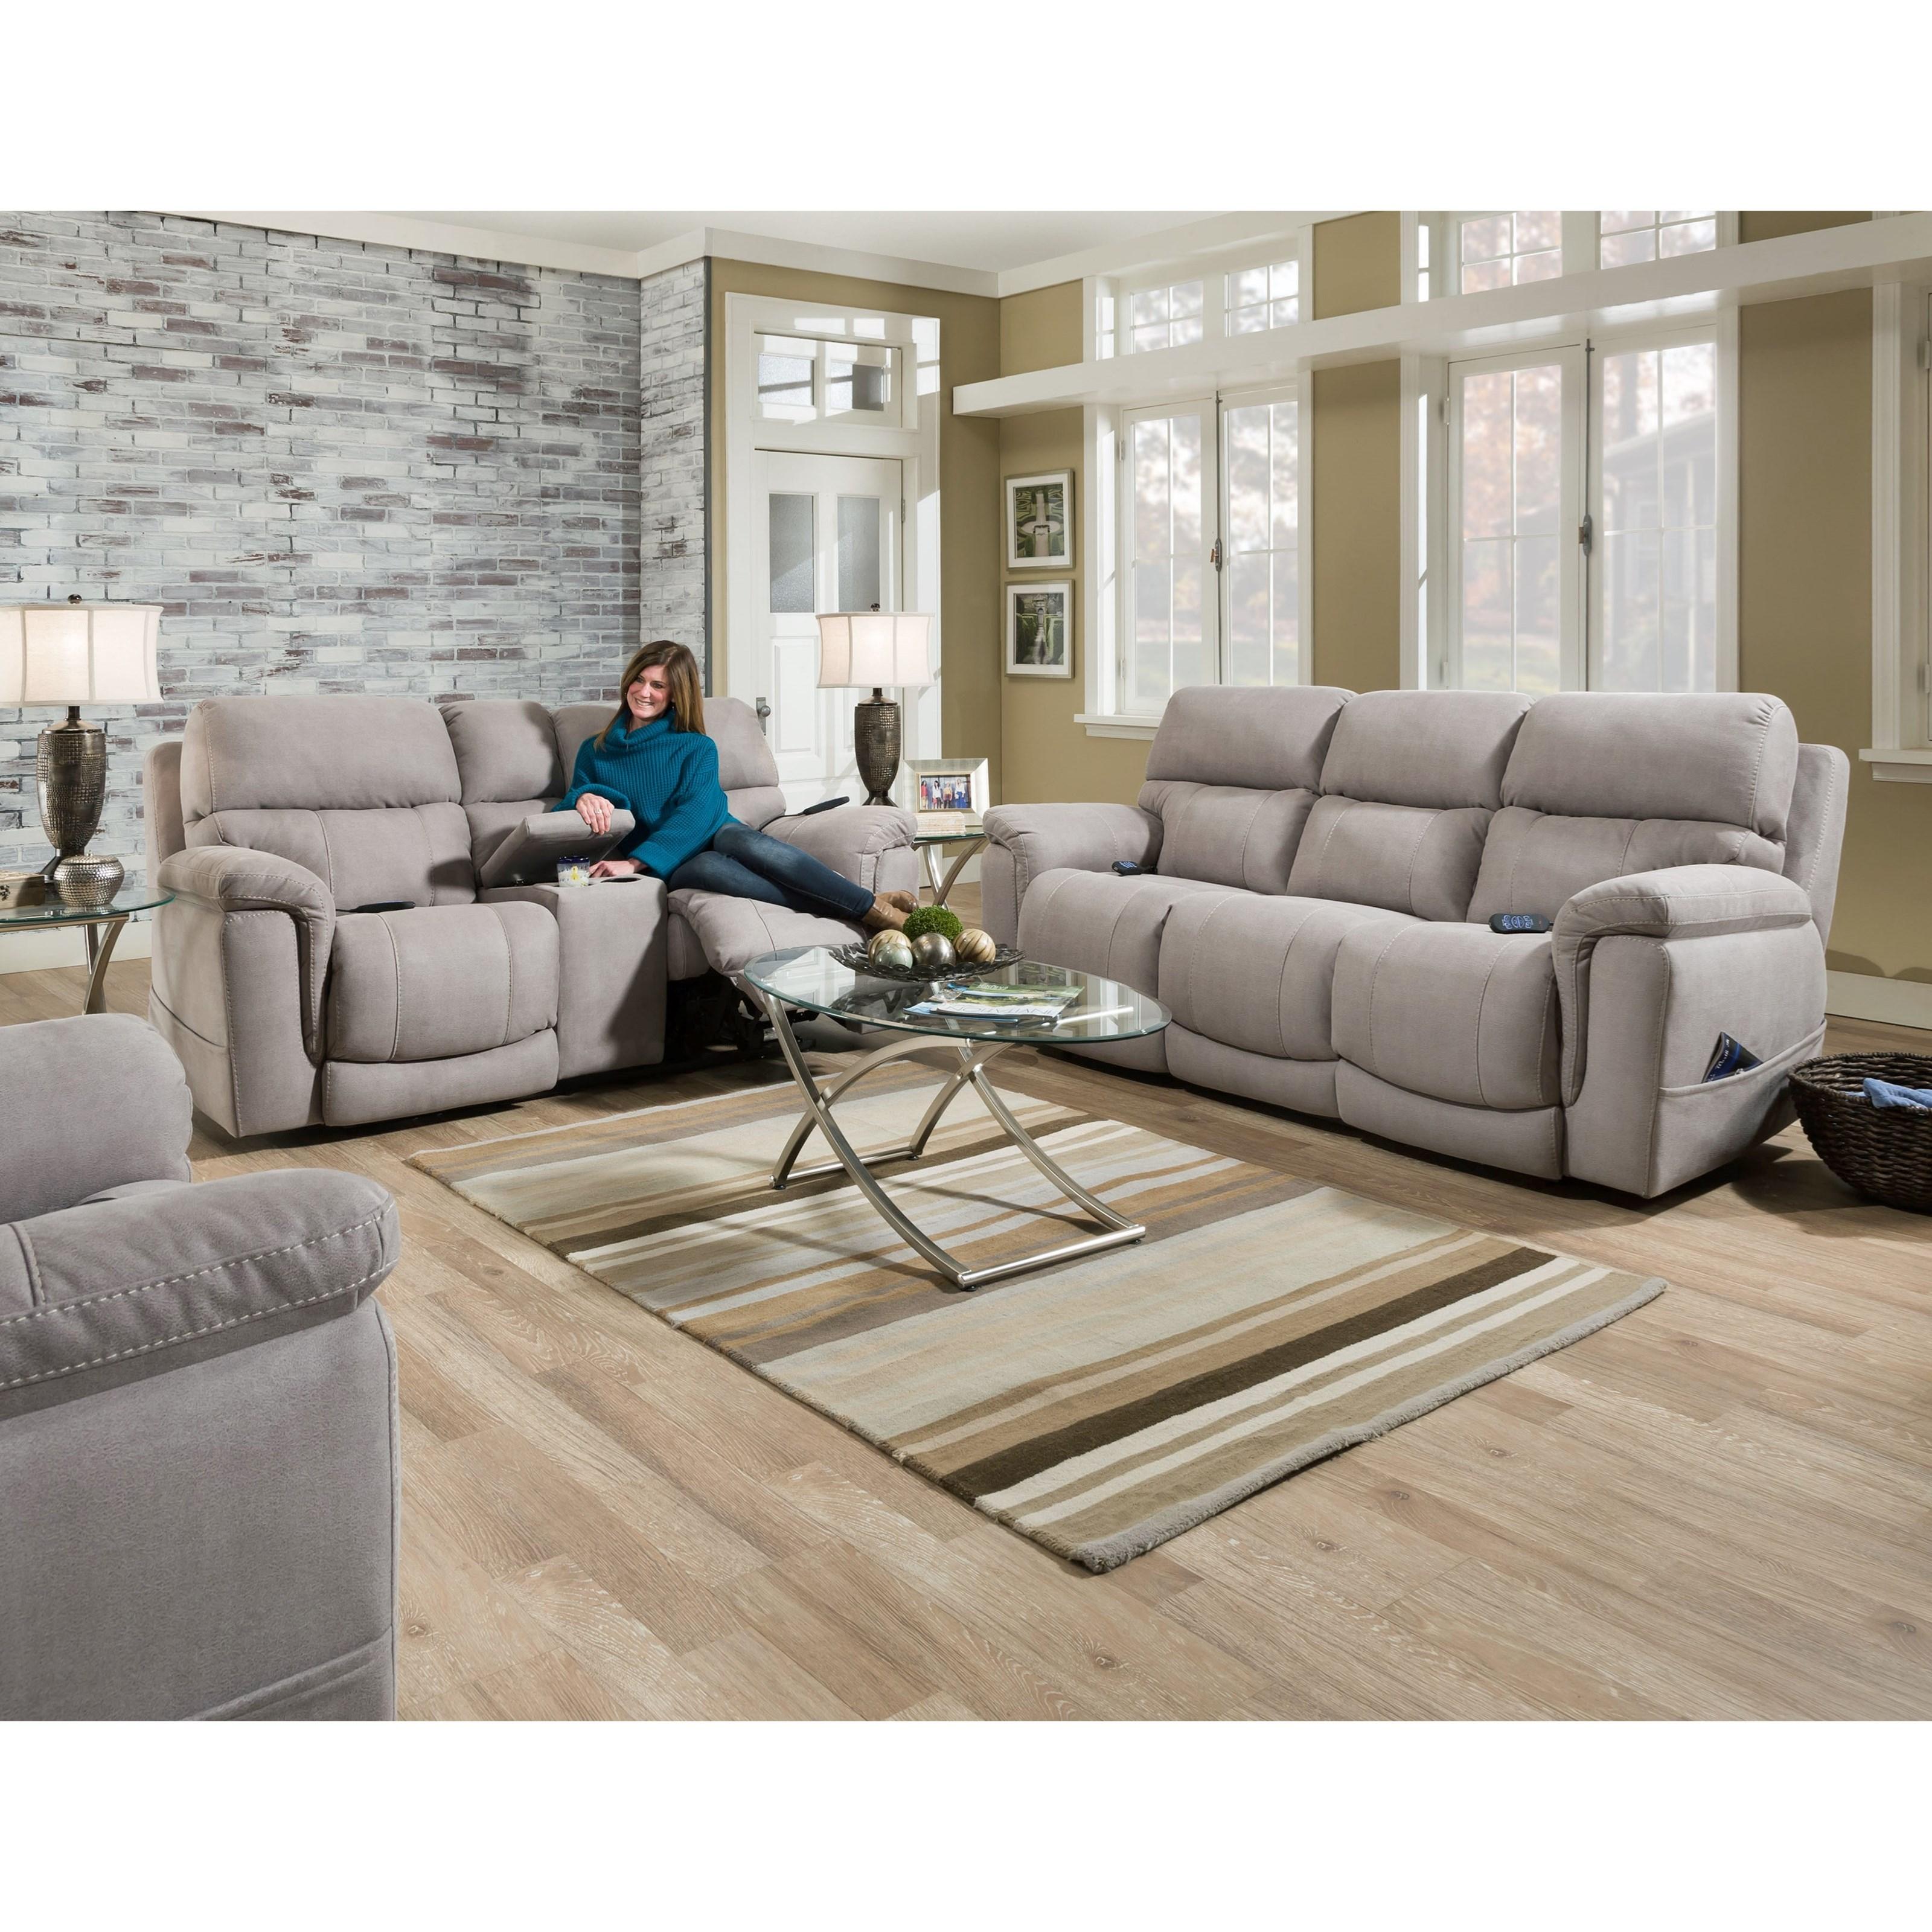 Tucson Double Reclining Power Sofa Ruby Gordon Home